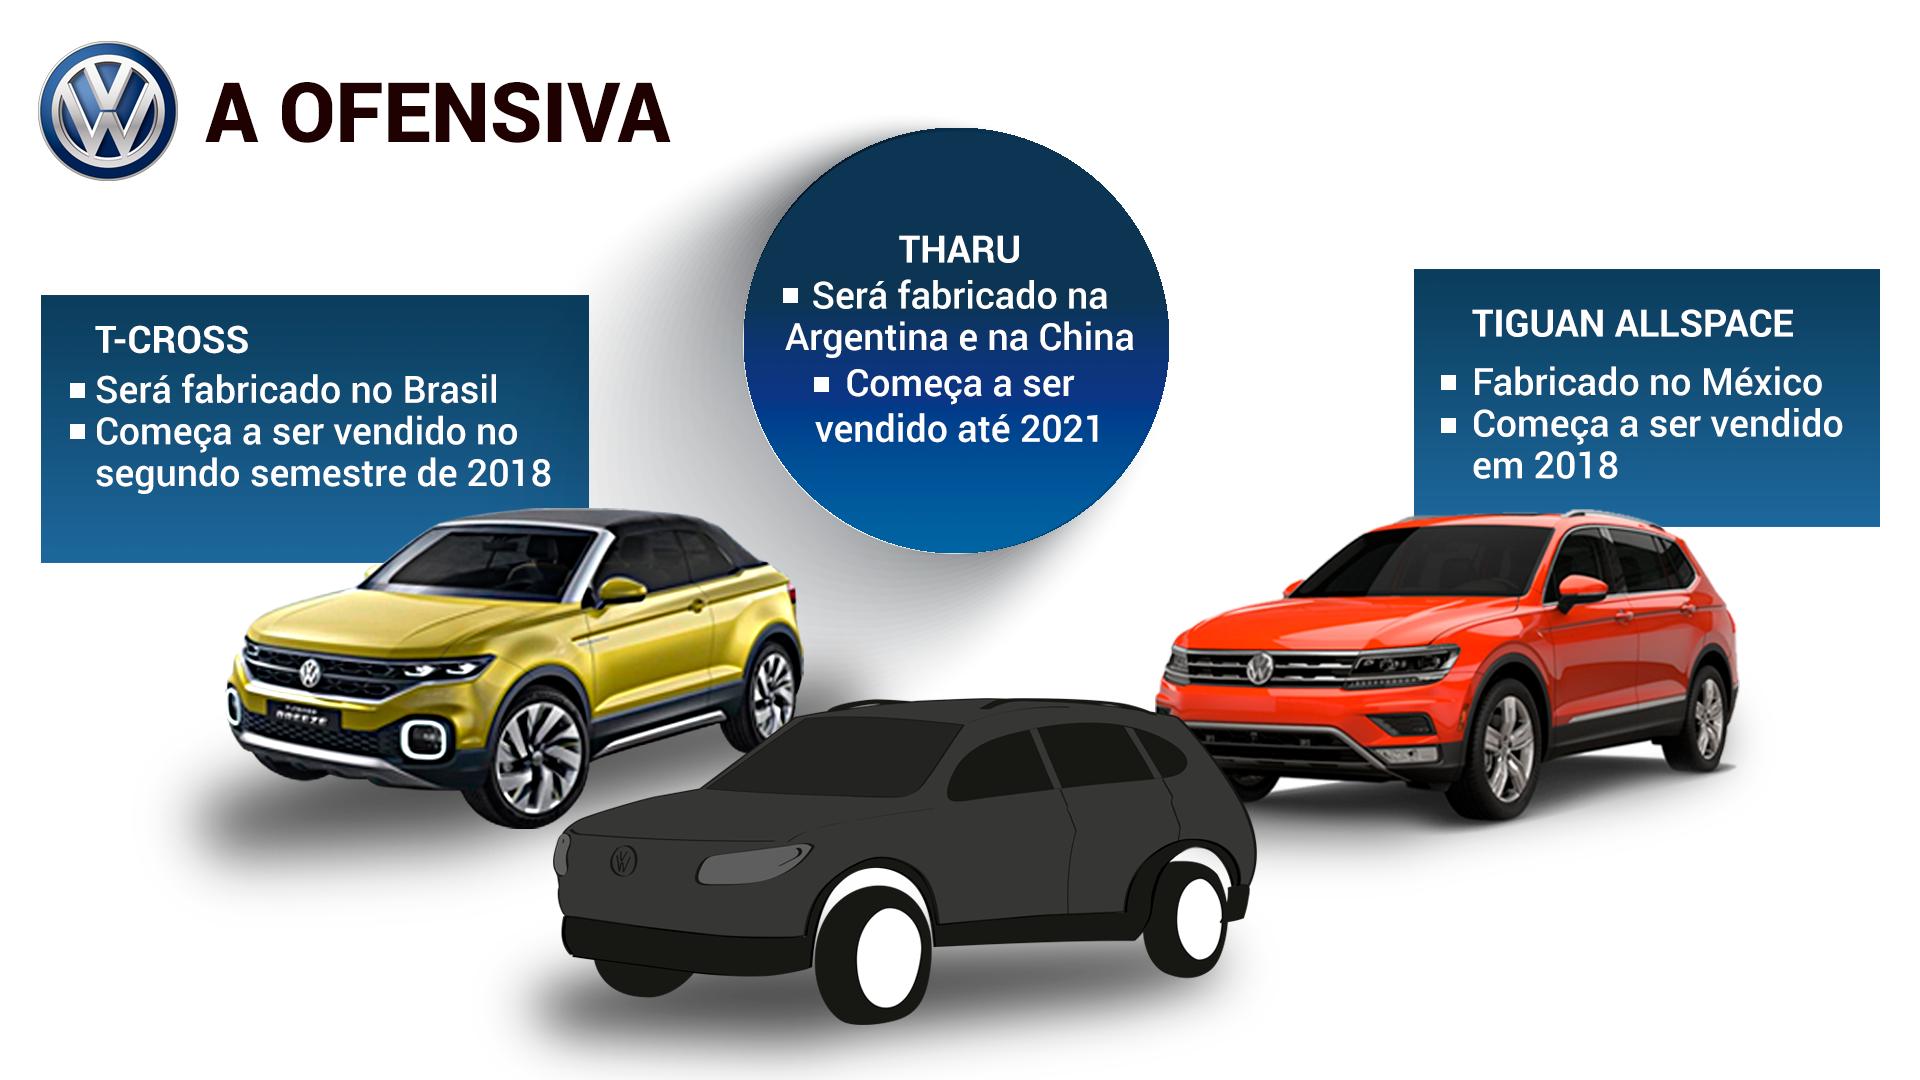 Tharu, o novo SUV da Volkswagen